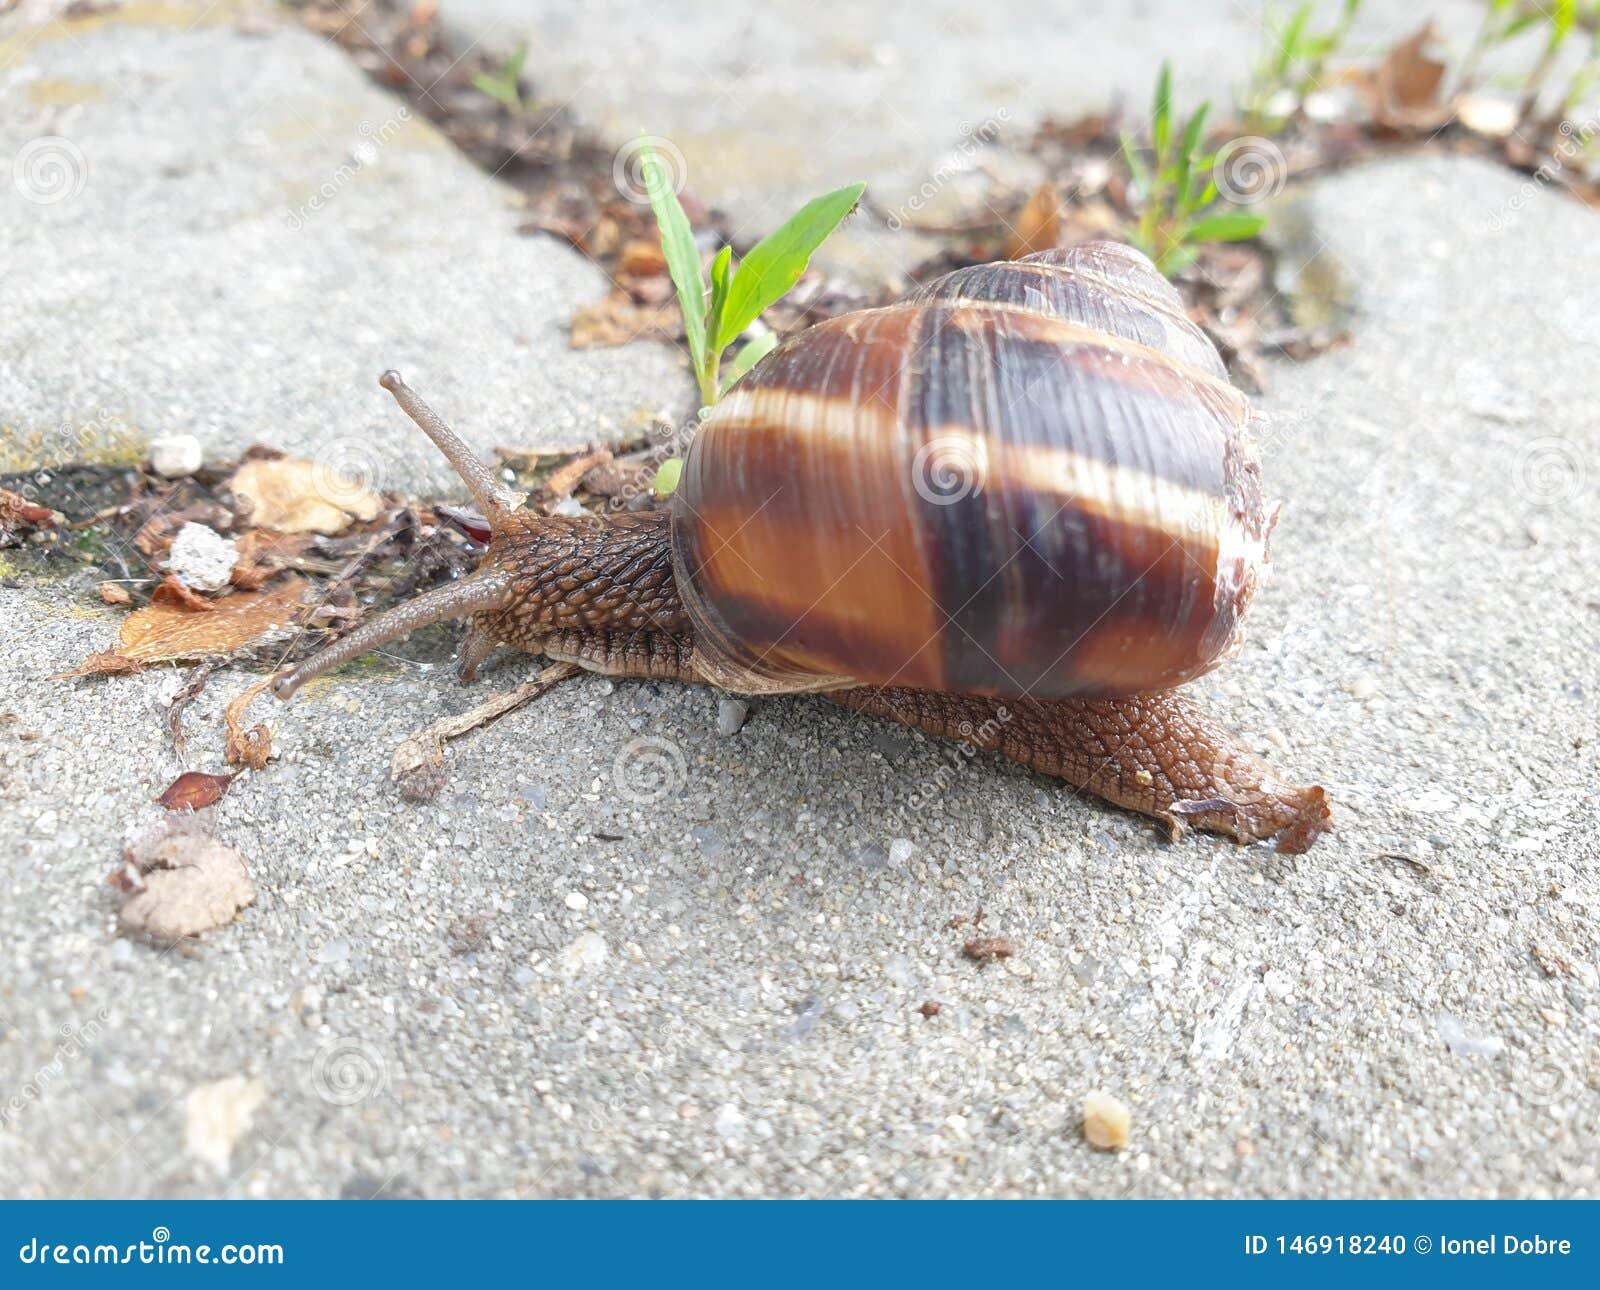 Konkret snail